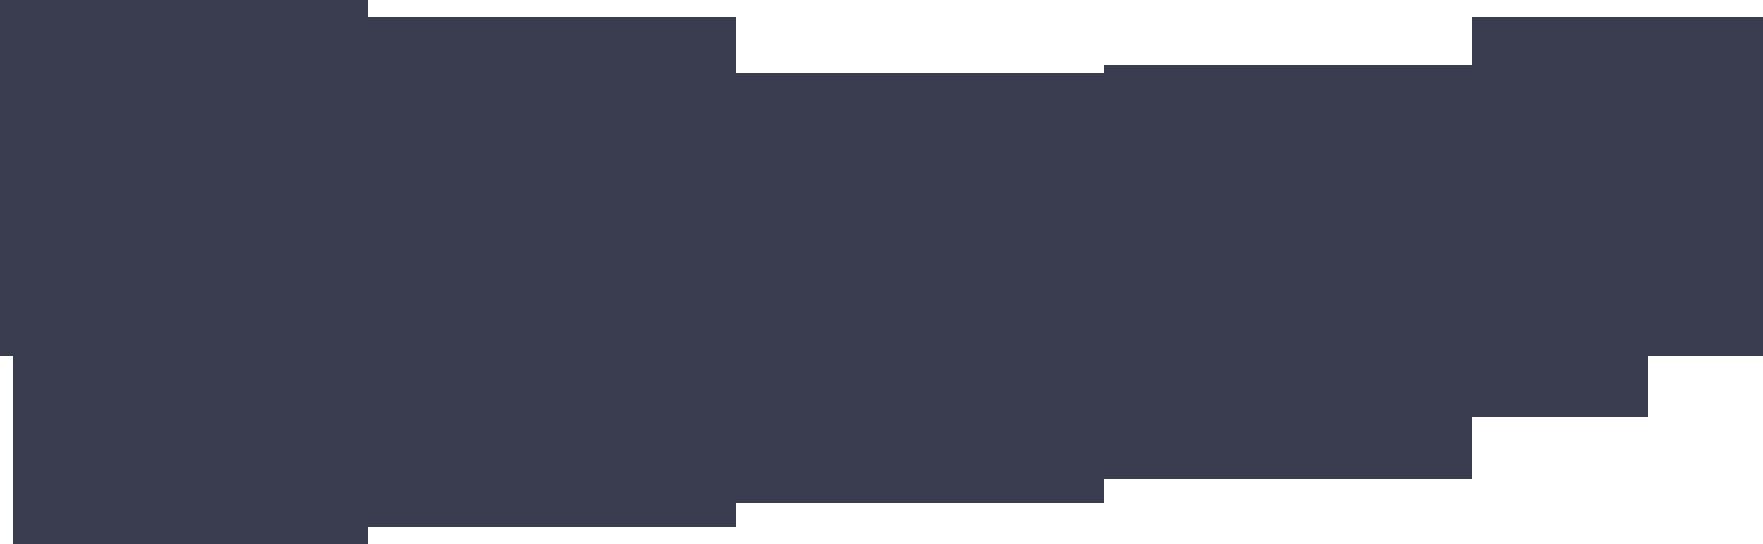 NEM(ネム) Catapult(カタパルト)